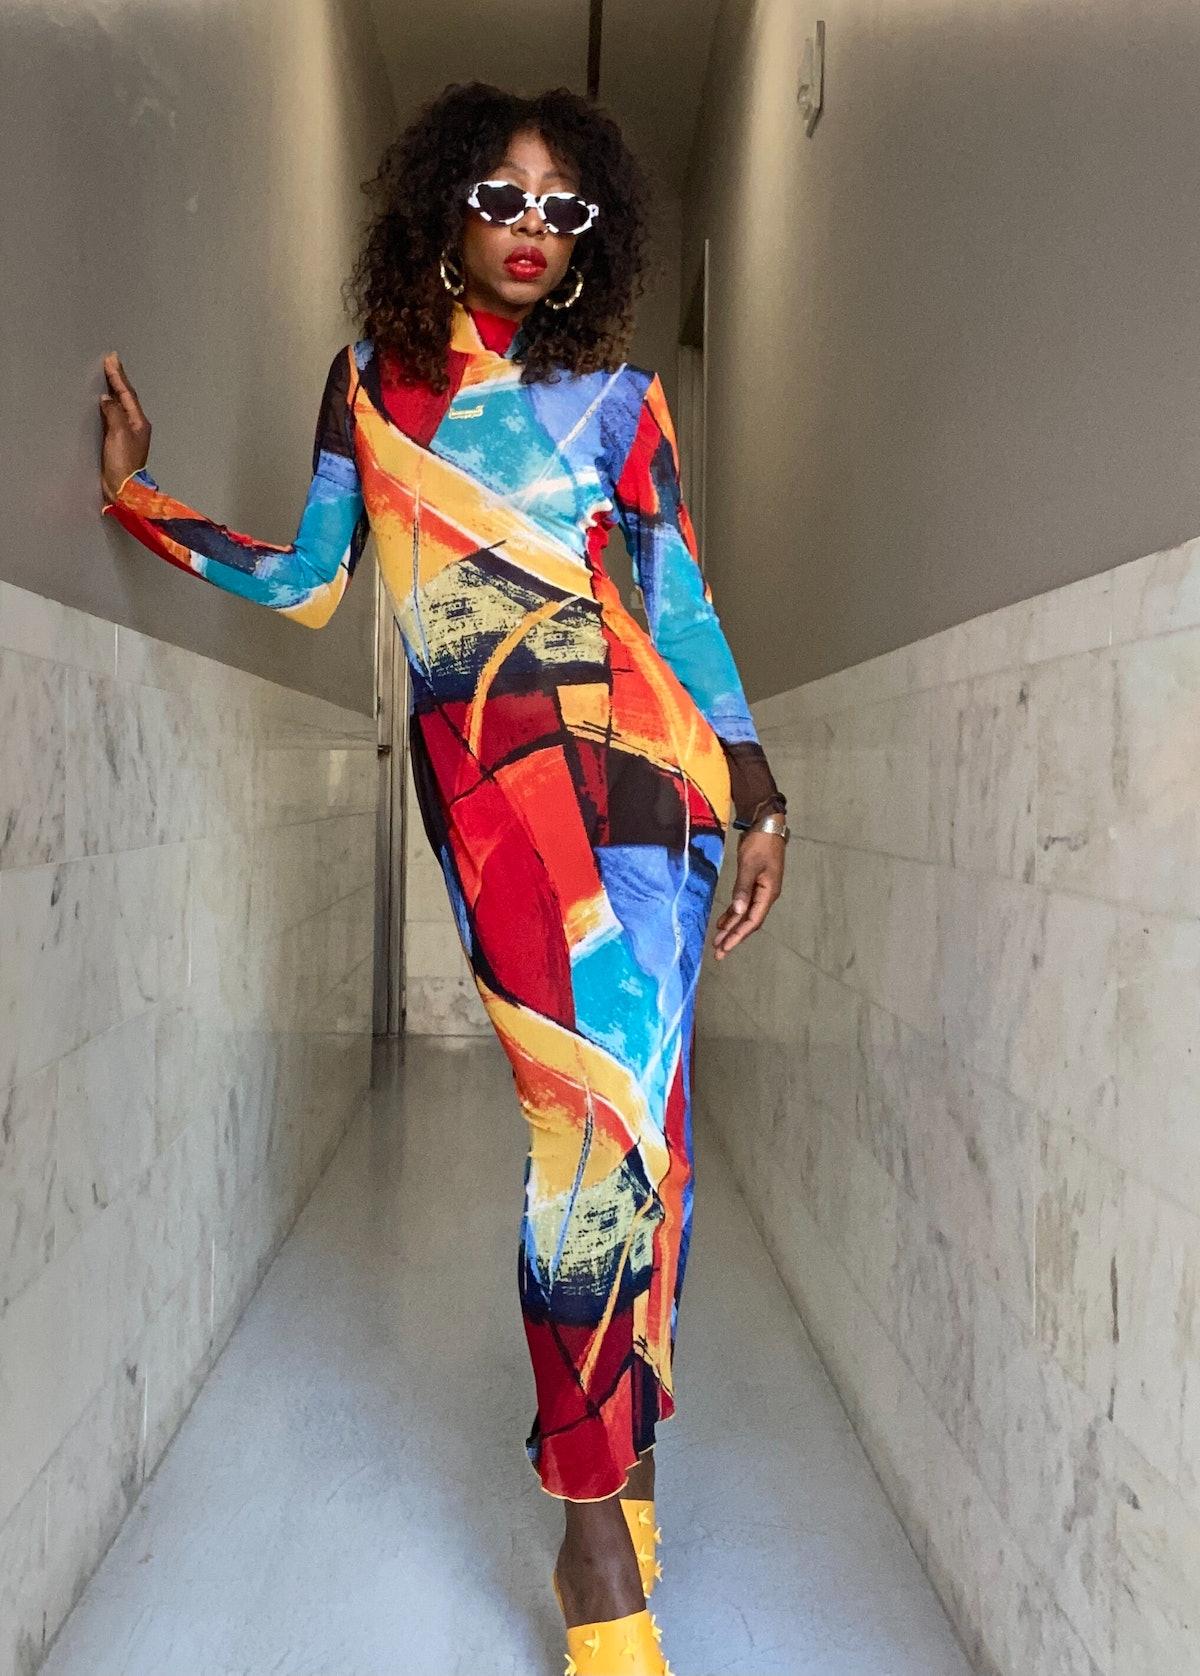 Cameron Mesh Dress Painted Full Length